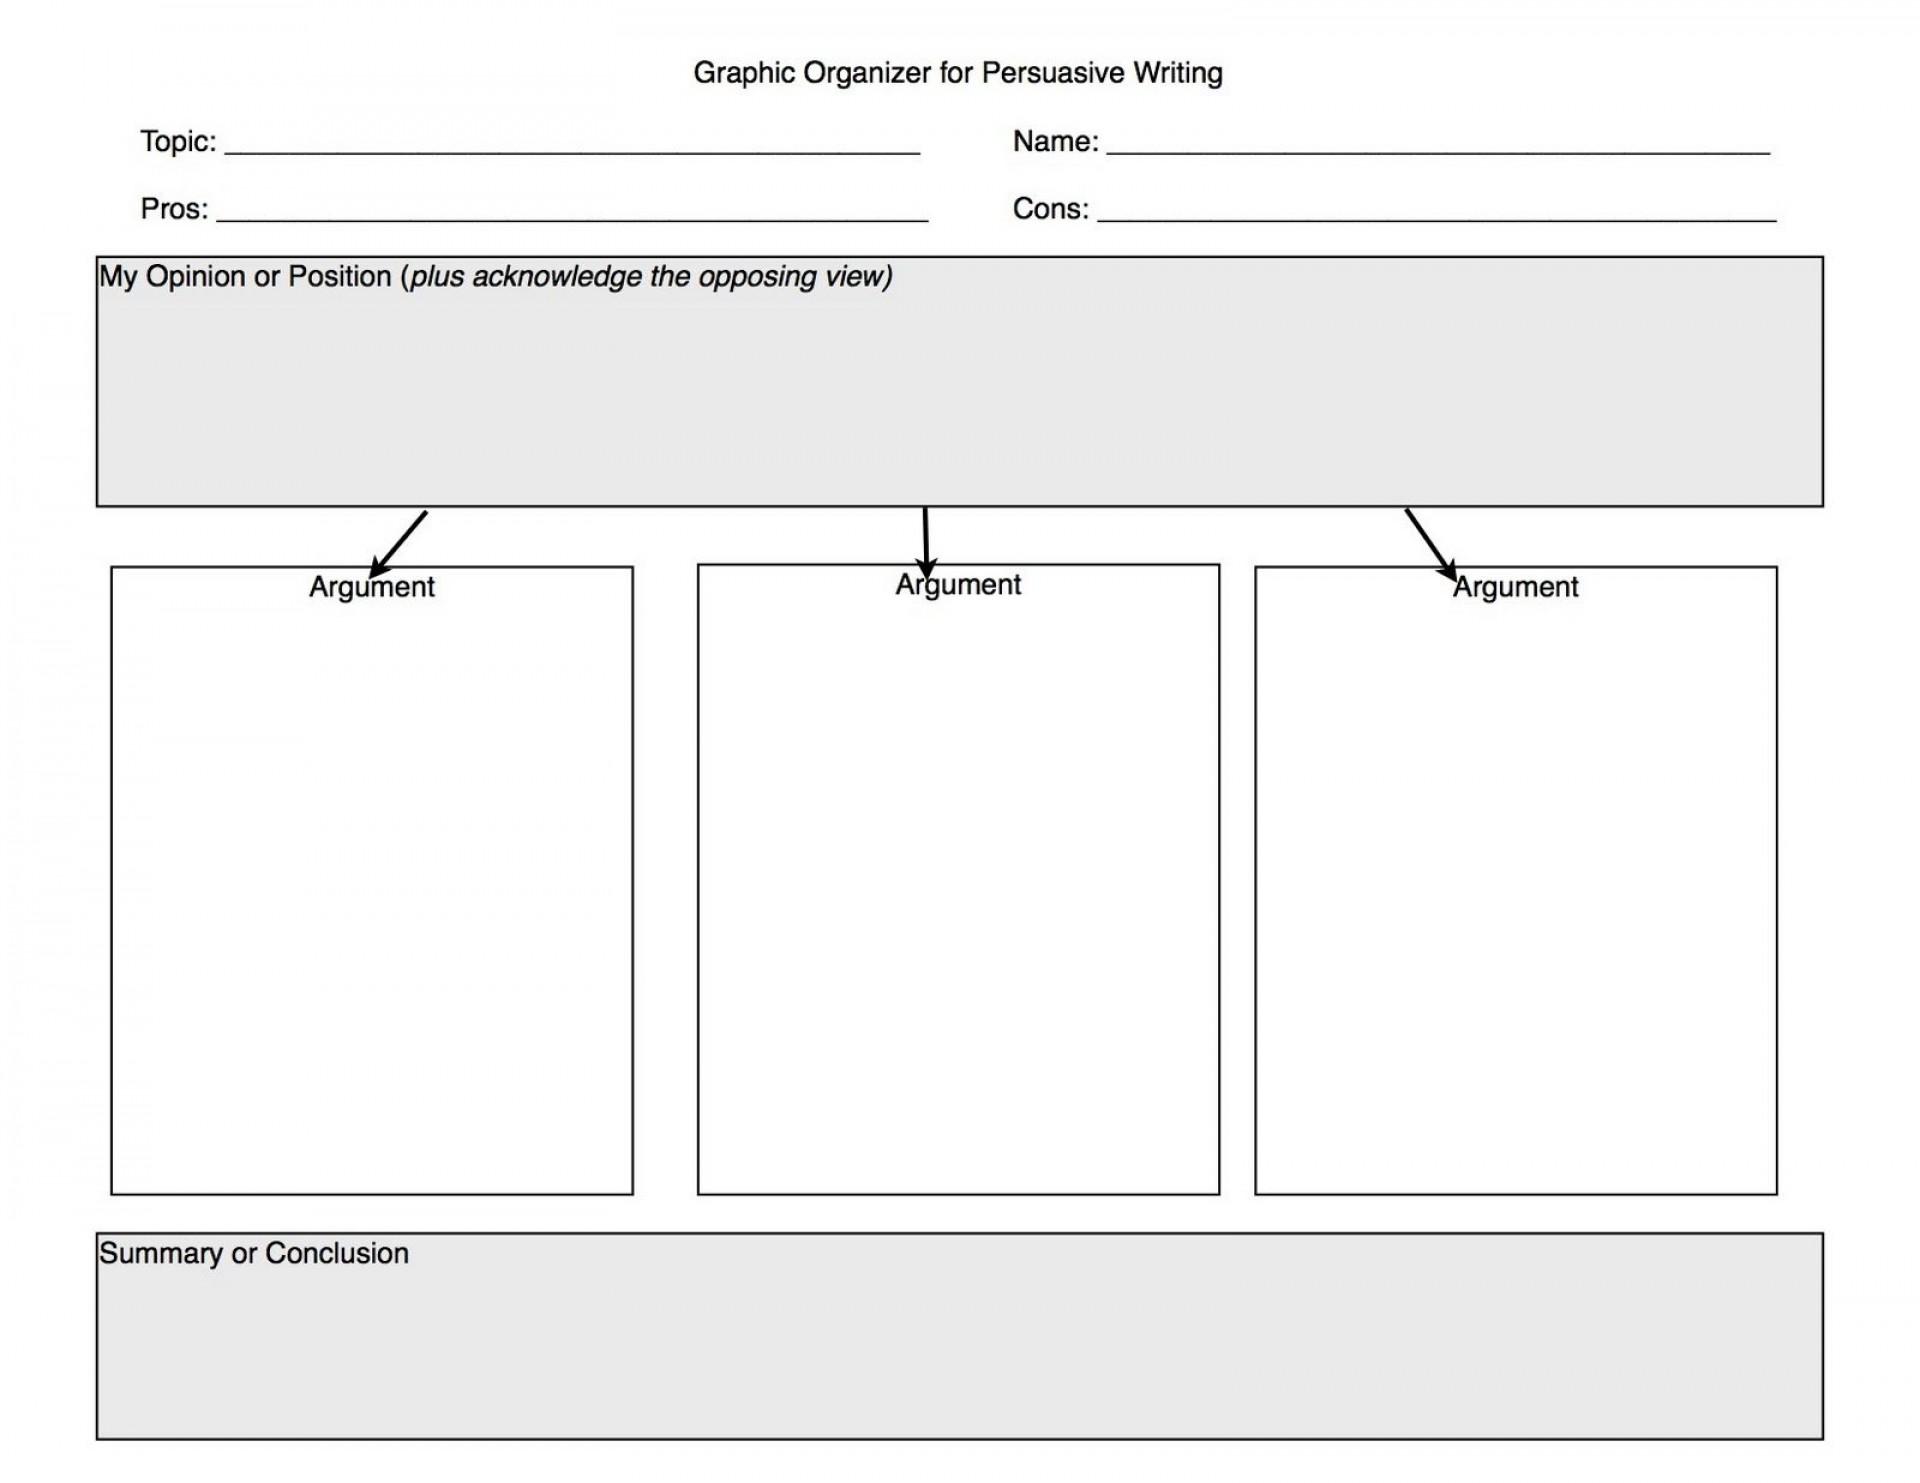 014 Essay Example College Organizer Surprising Application Graphic Organizers Argumentative 1920